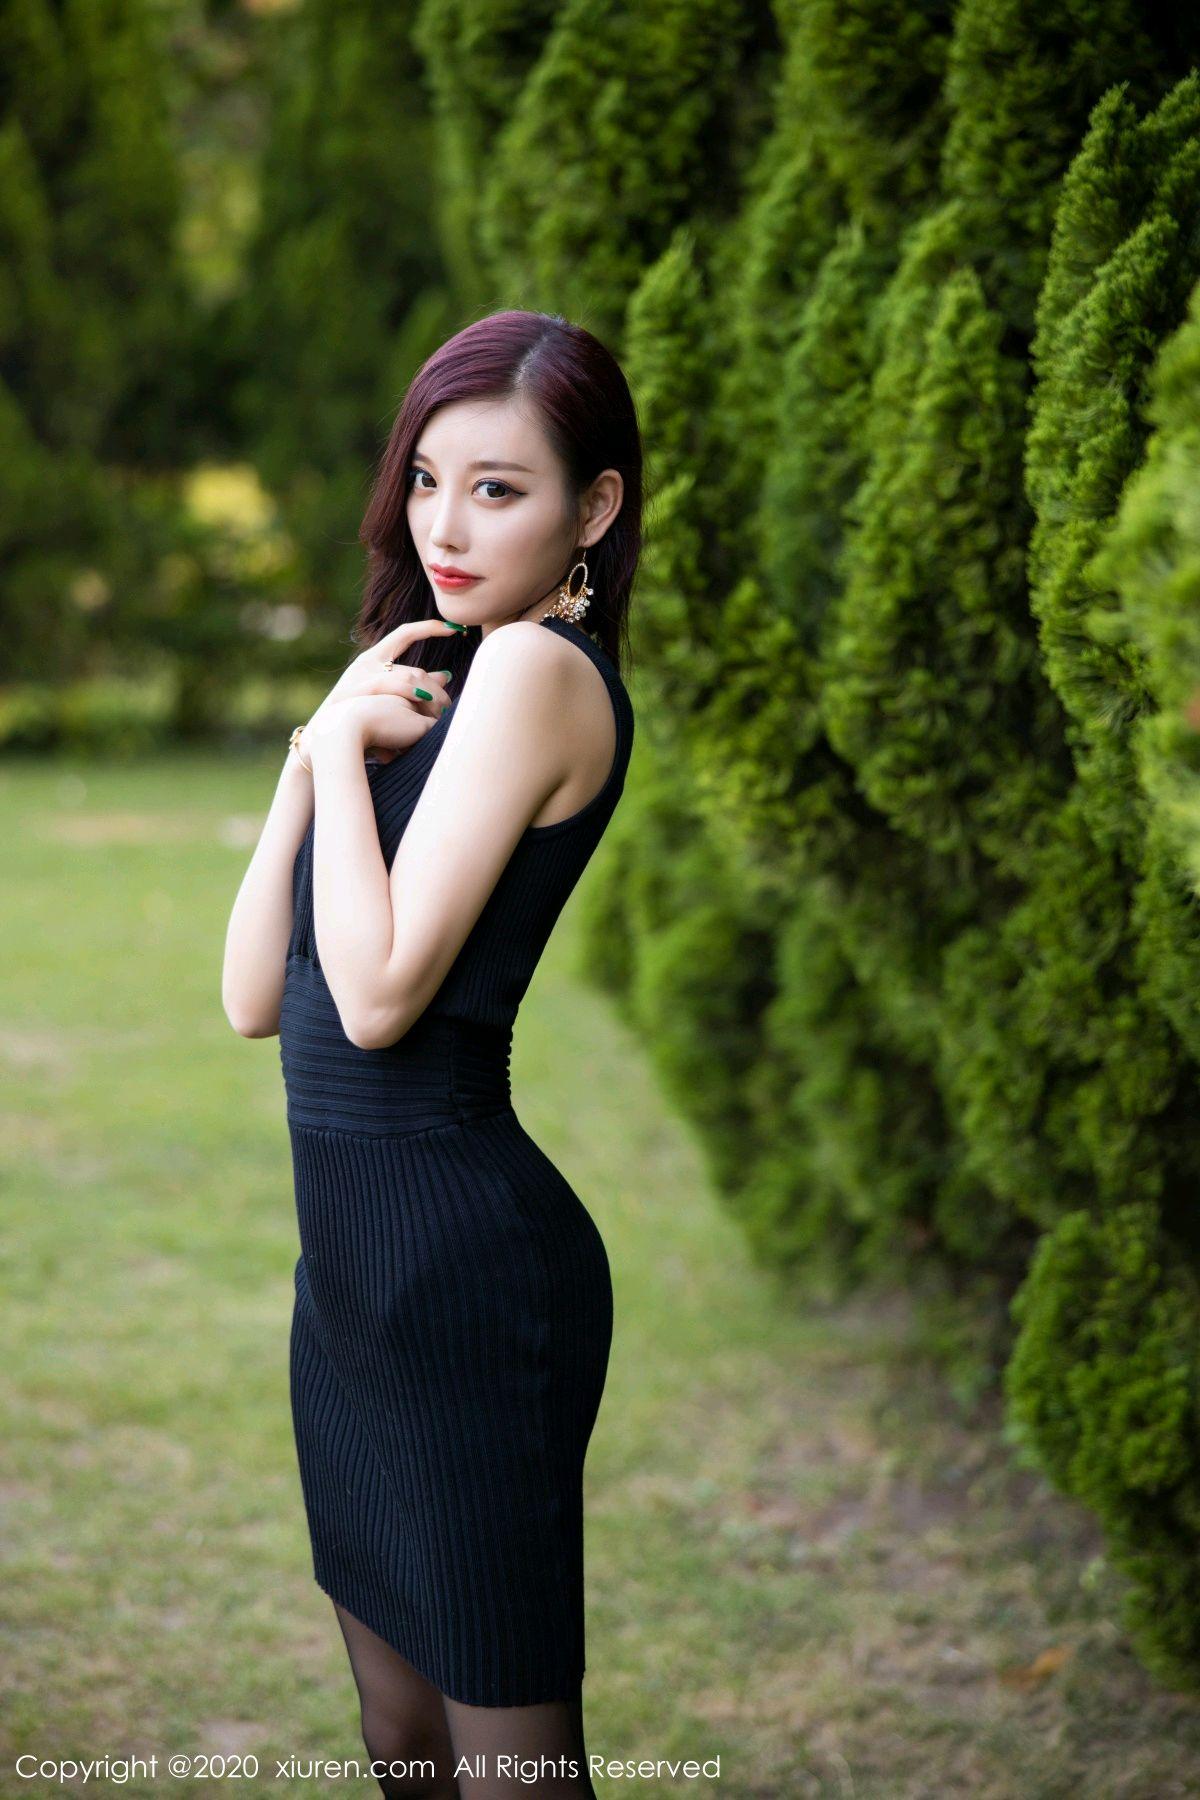 [XiuRen] Vol.2648 Yang Chen Chen 42P, Black Silk, Outdoor, Xiuren, Yang Chen Chen